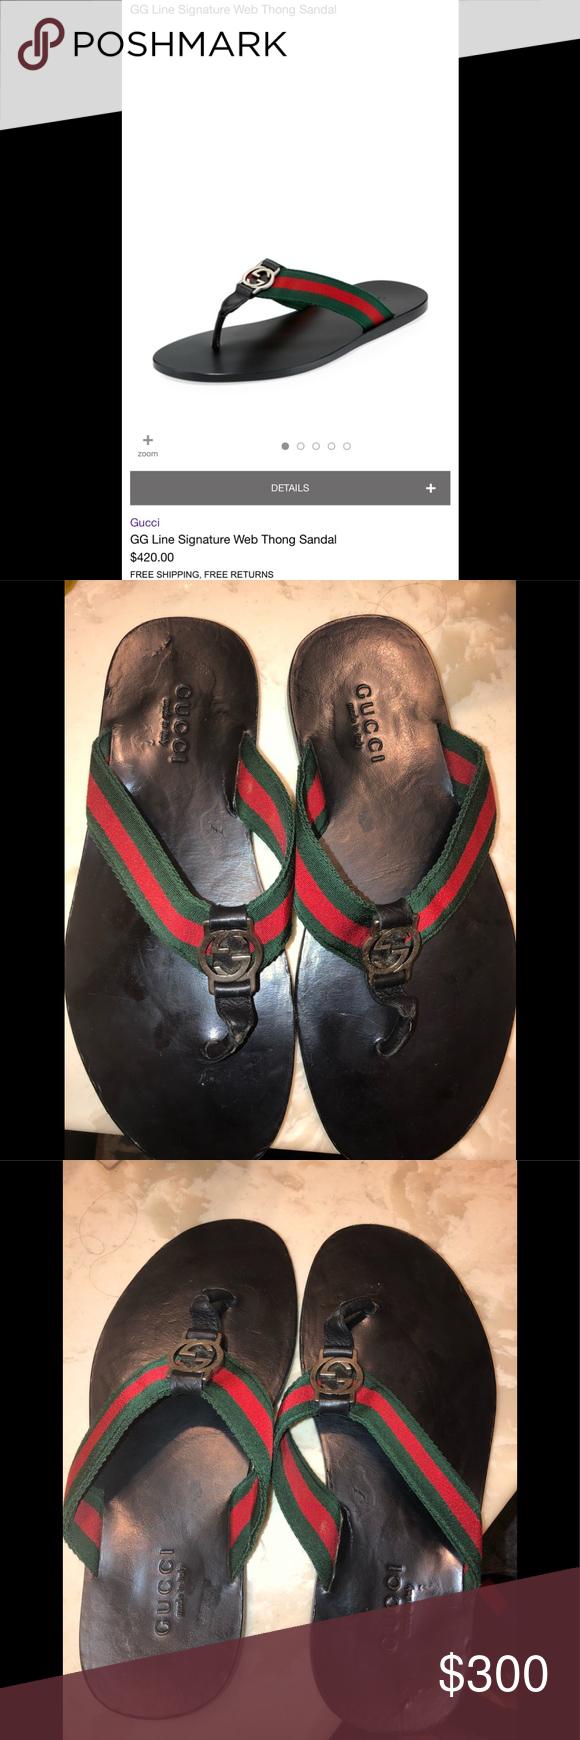 a05eb48a66bda Gucci GG line signature web sandal 7 Beautiful pre-owned pre-loved Gucci  thong